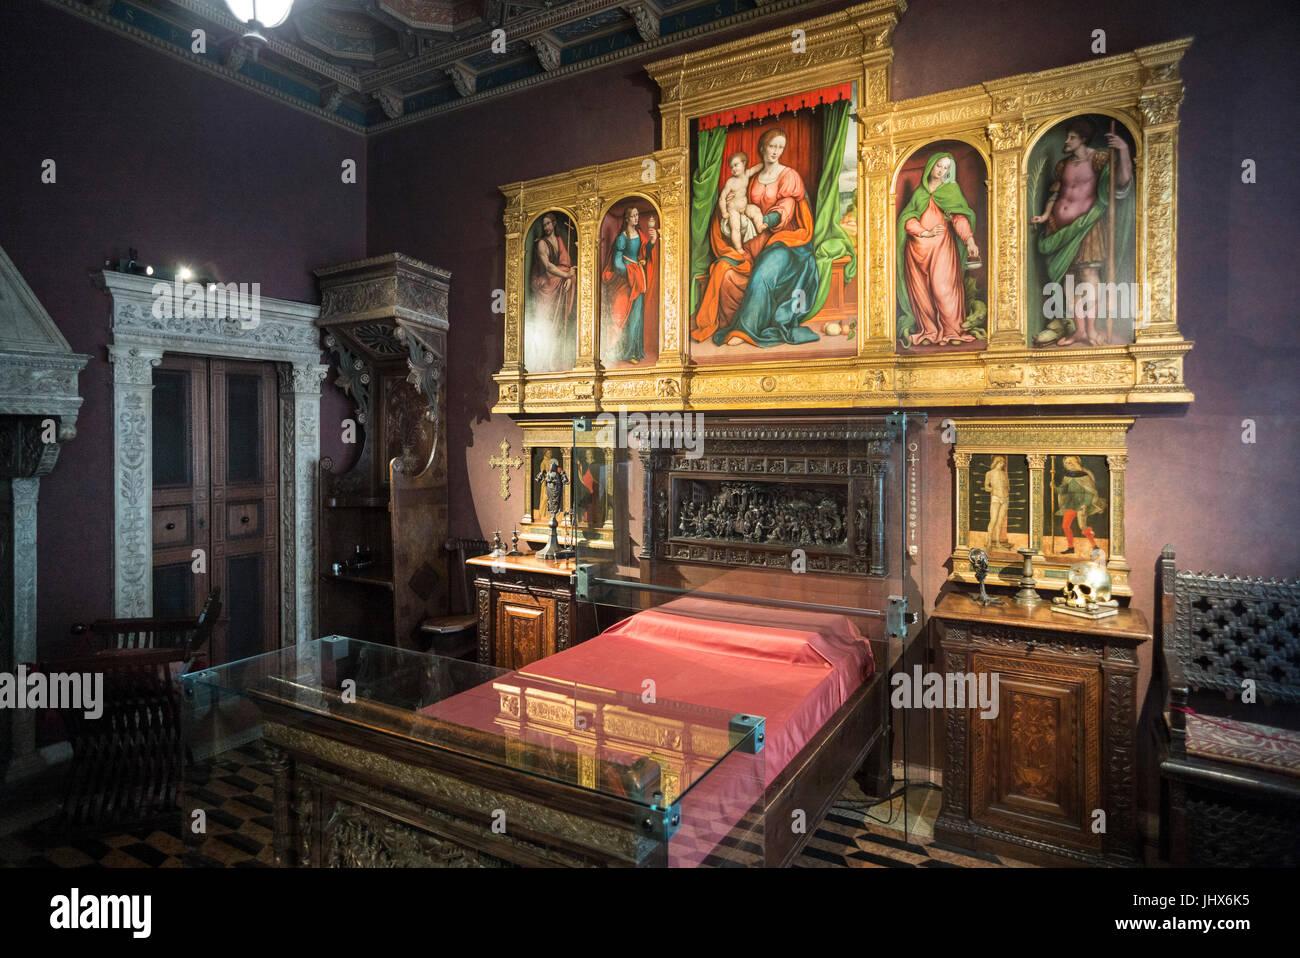 Milan. L'Italie. Museo Musée Bagatti Valsecchi, Fausto Bagatti Valsecchi, le prix du lit de Valteline. Photo Stock